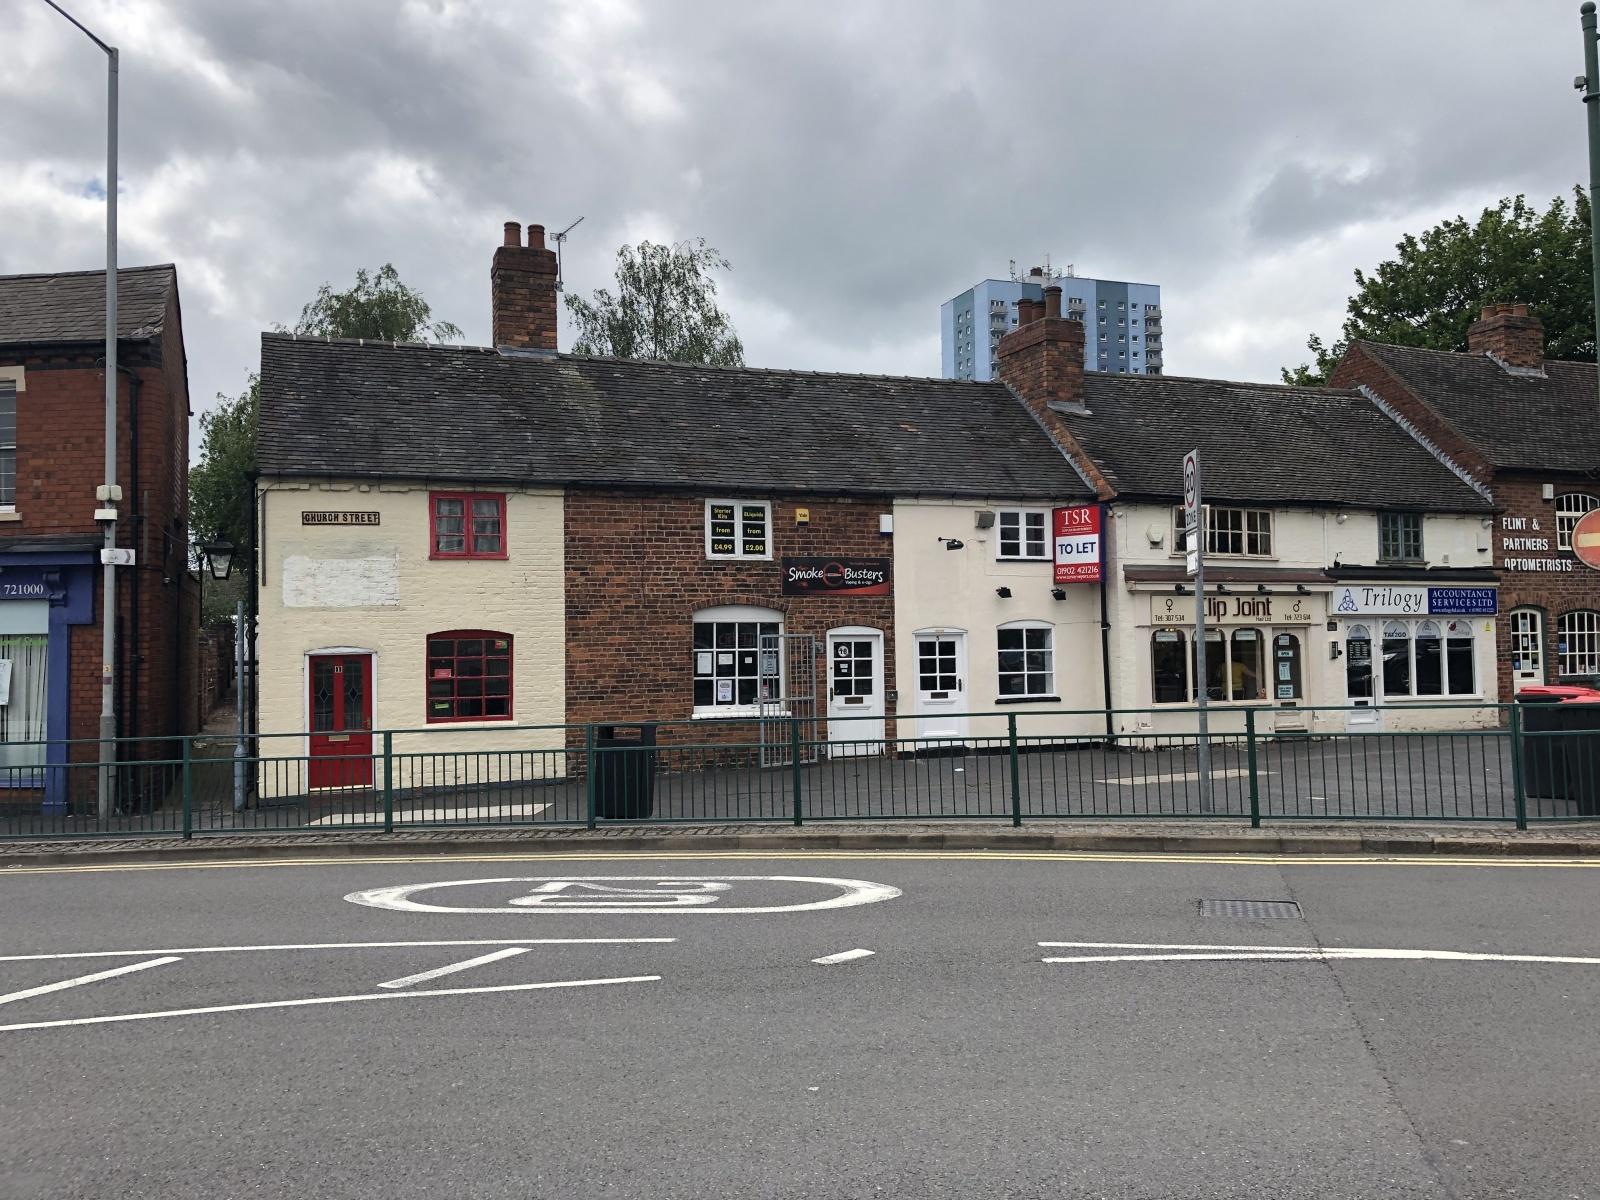 5, Church Street, Wednesfield, West Midlands